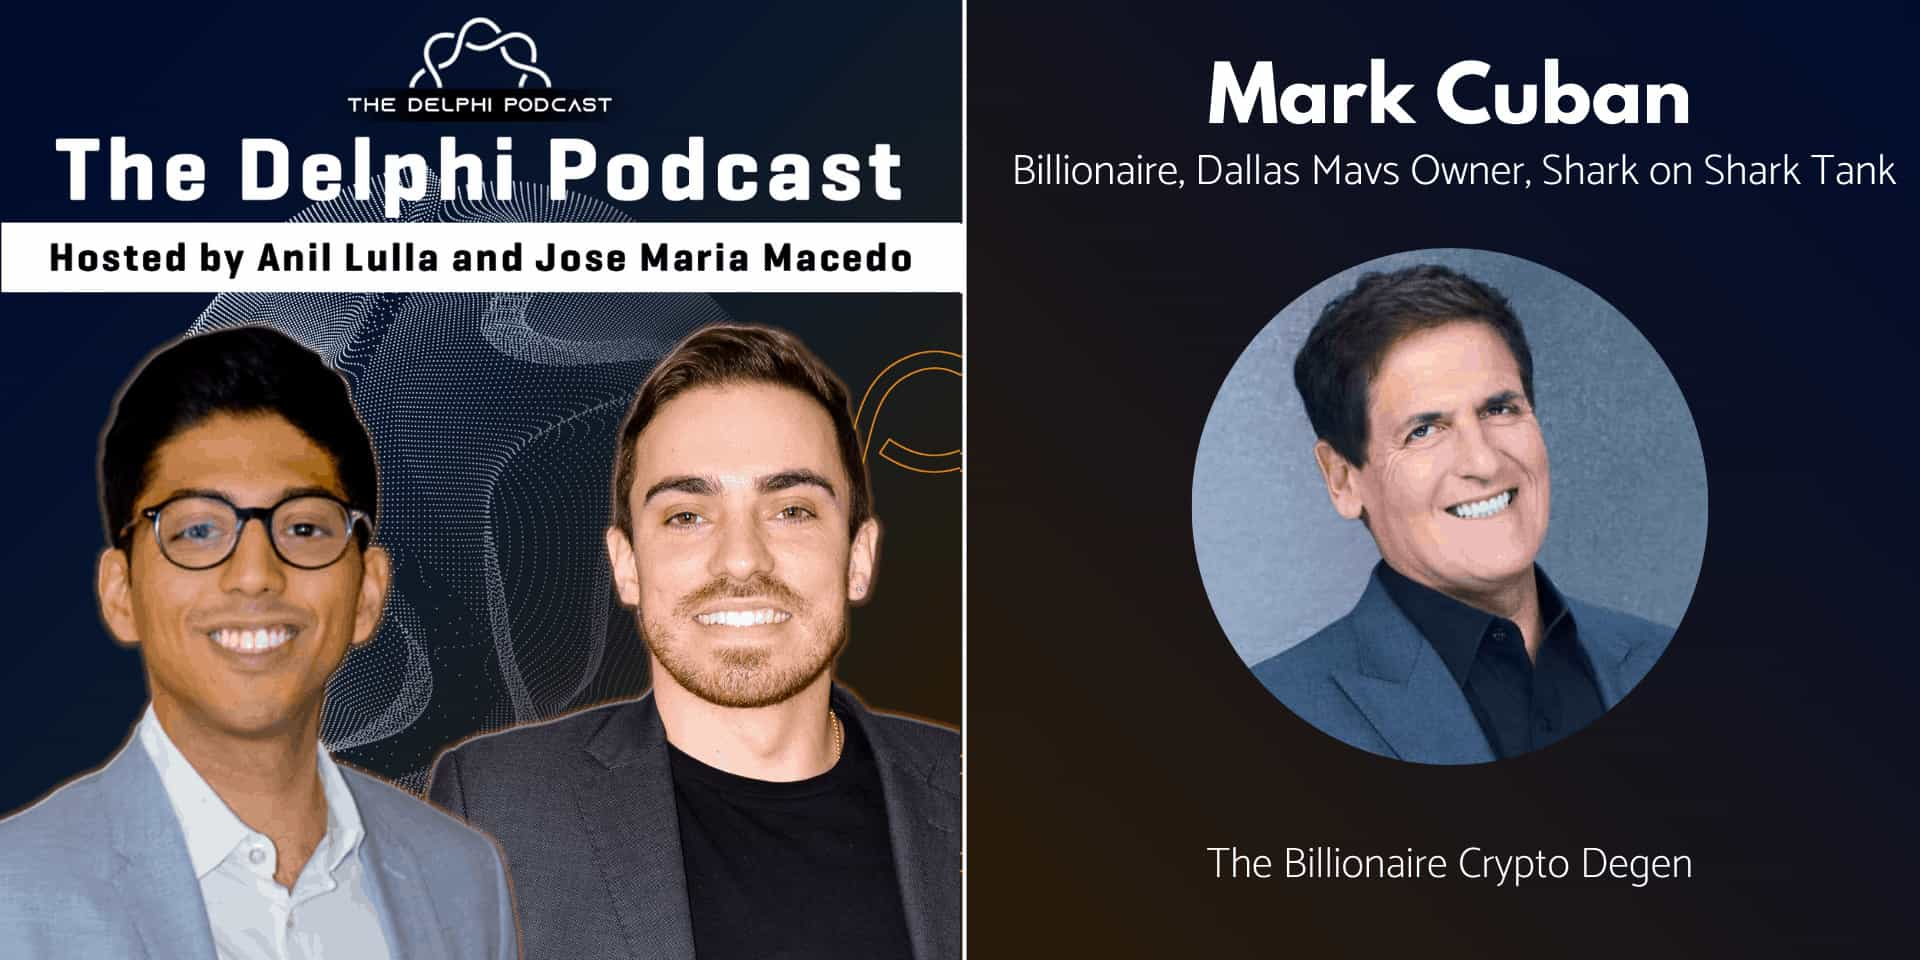 Mark Cuban: The Billionaire Crypto Degen